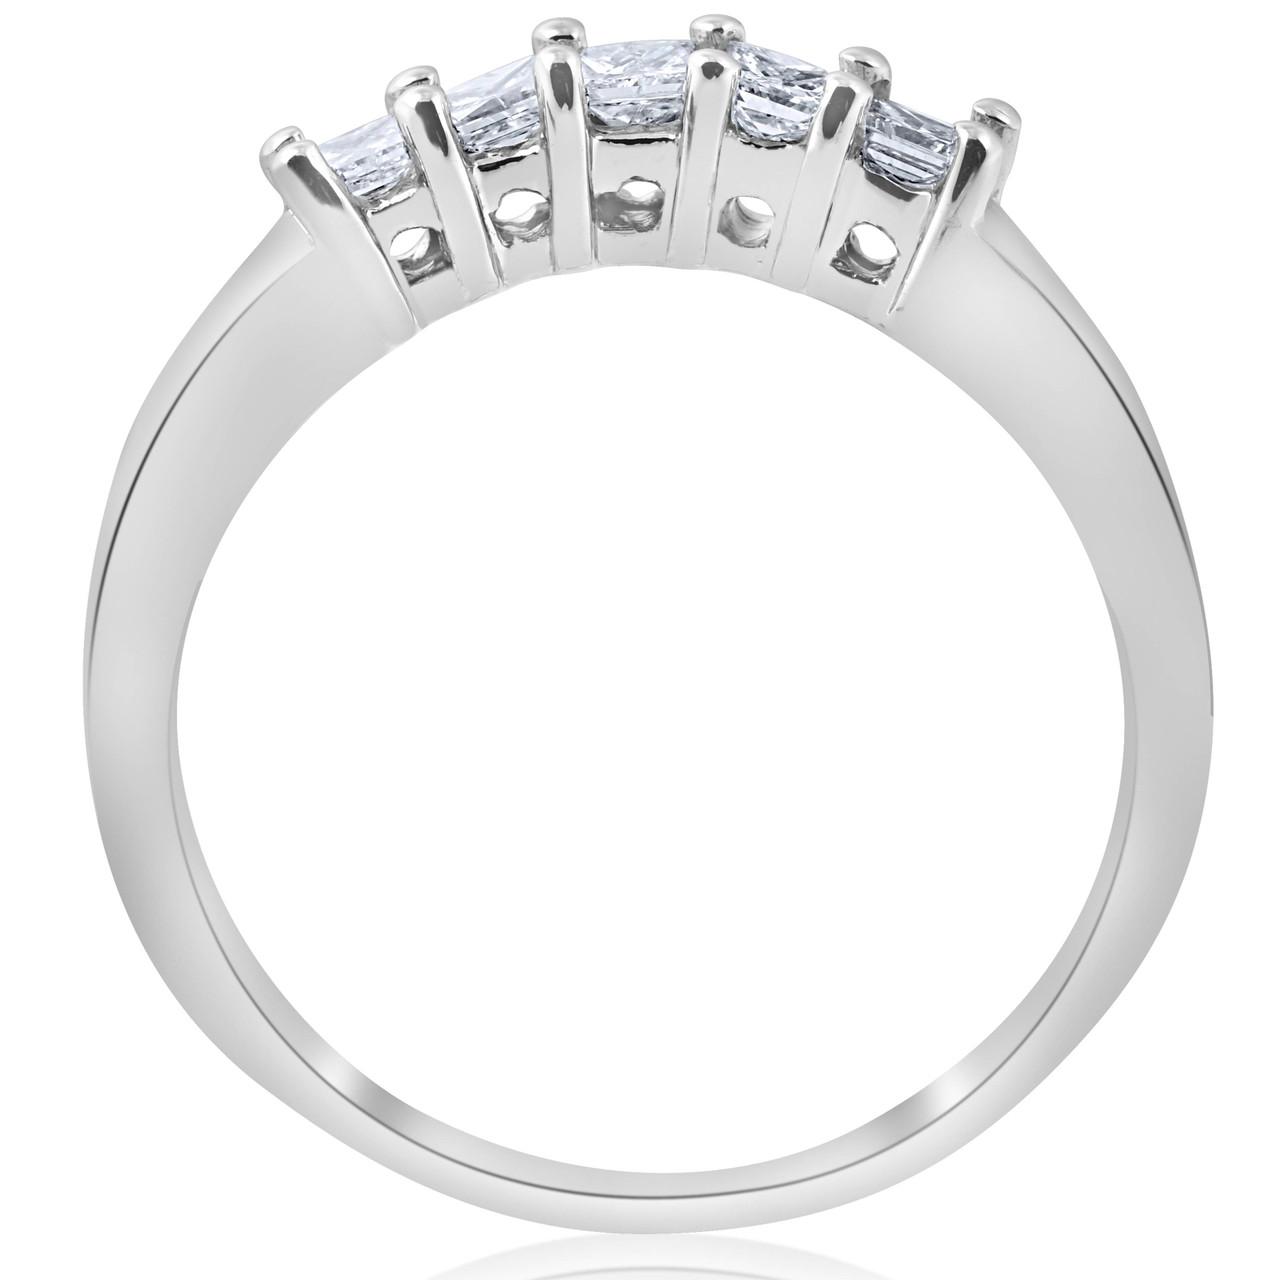 12ct Princess Cut Diamond Curved Wedding Ring Enhancer 14K White Gold